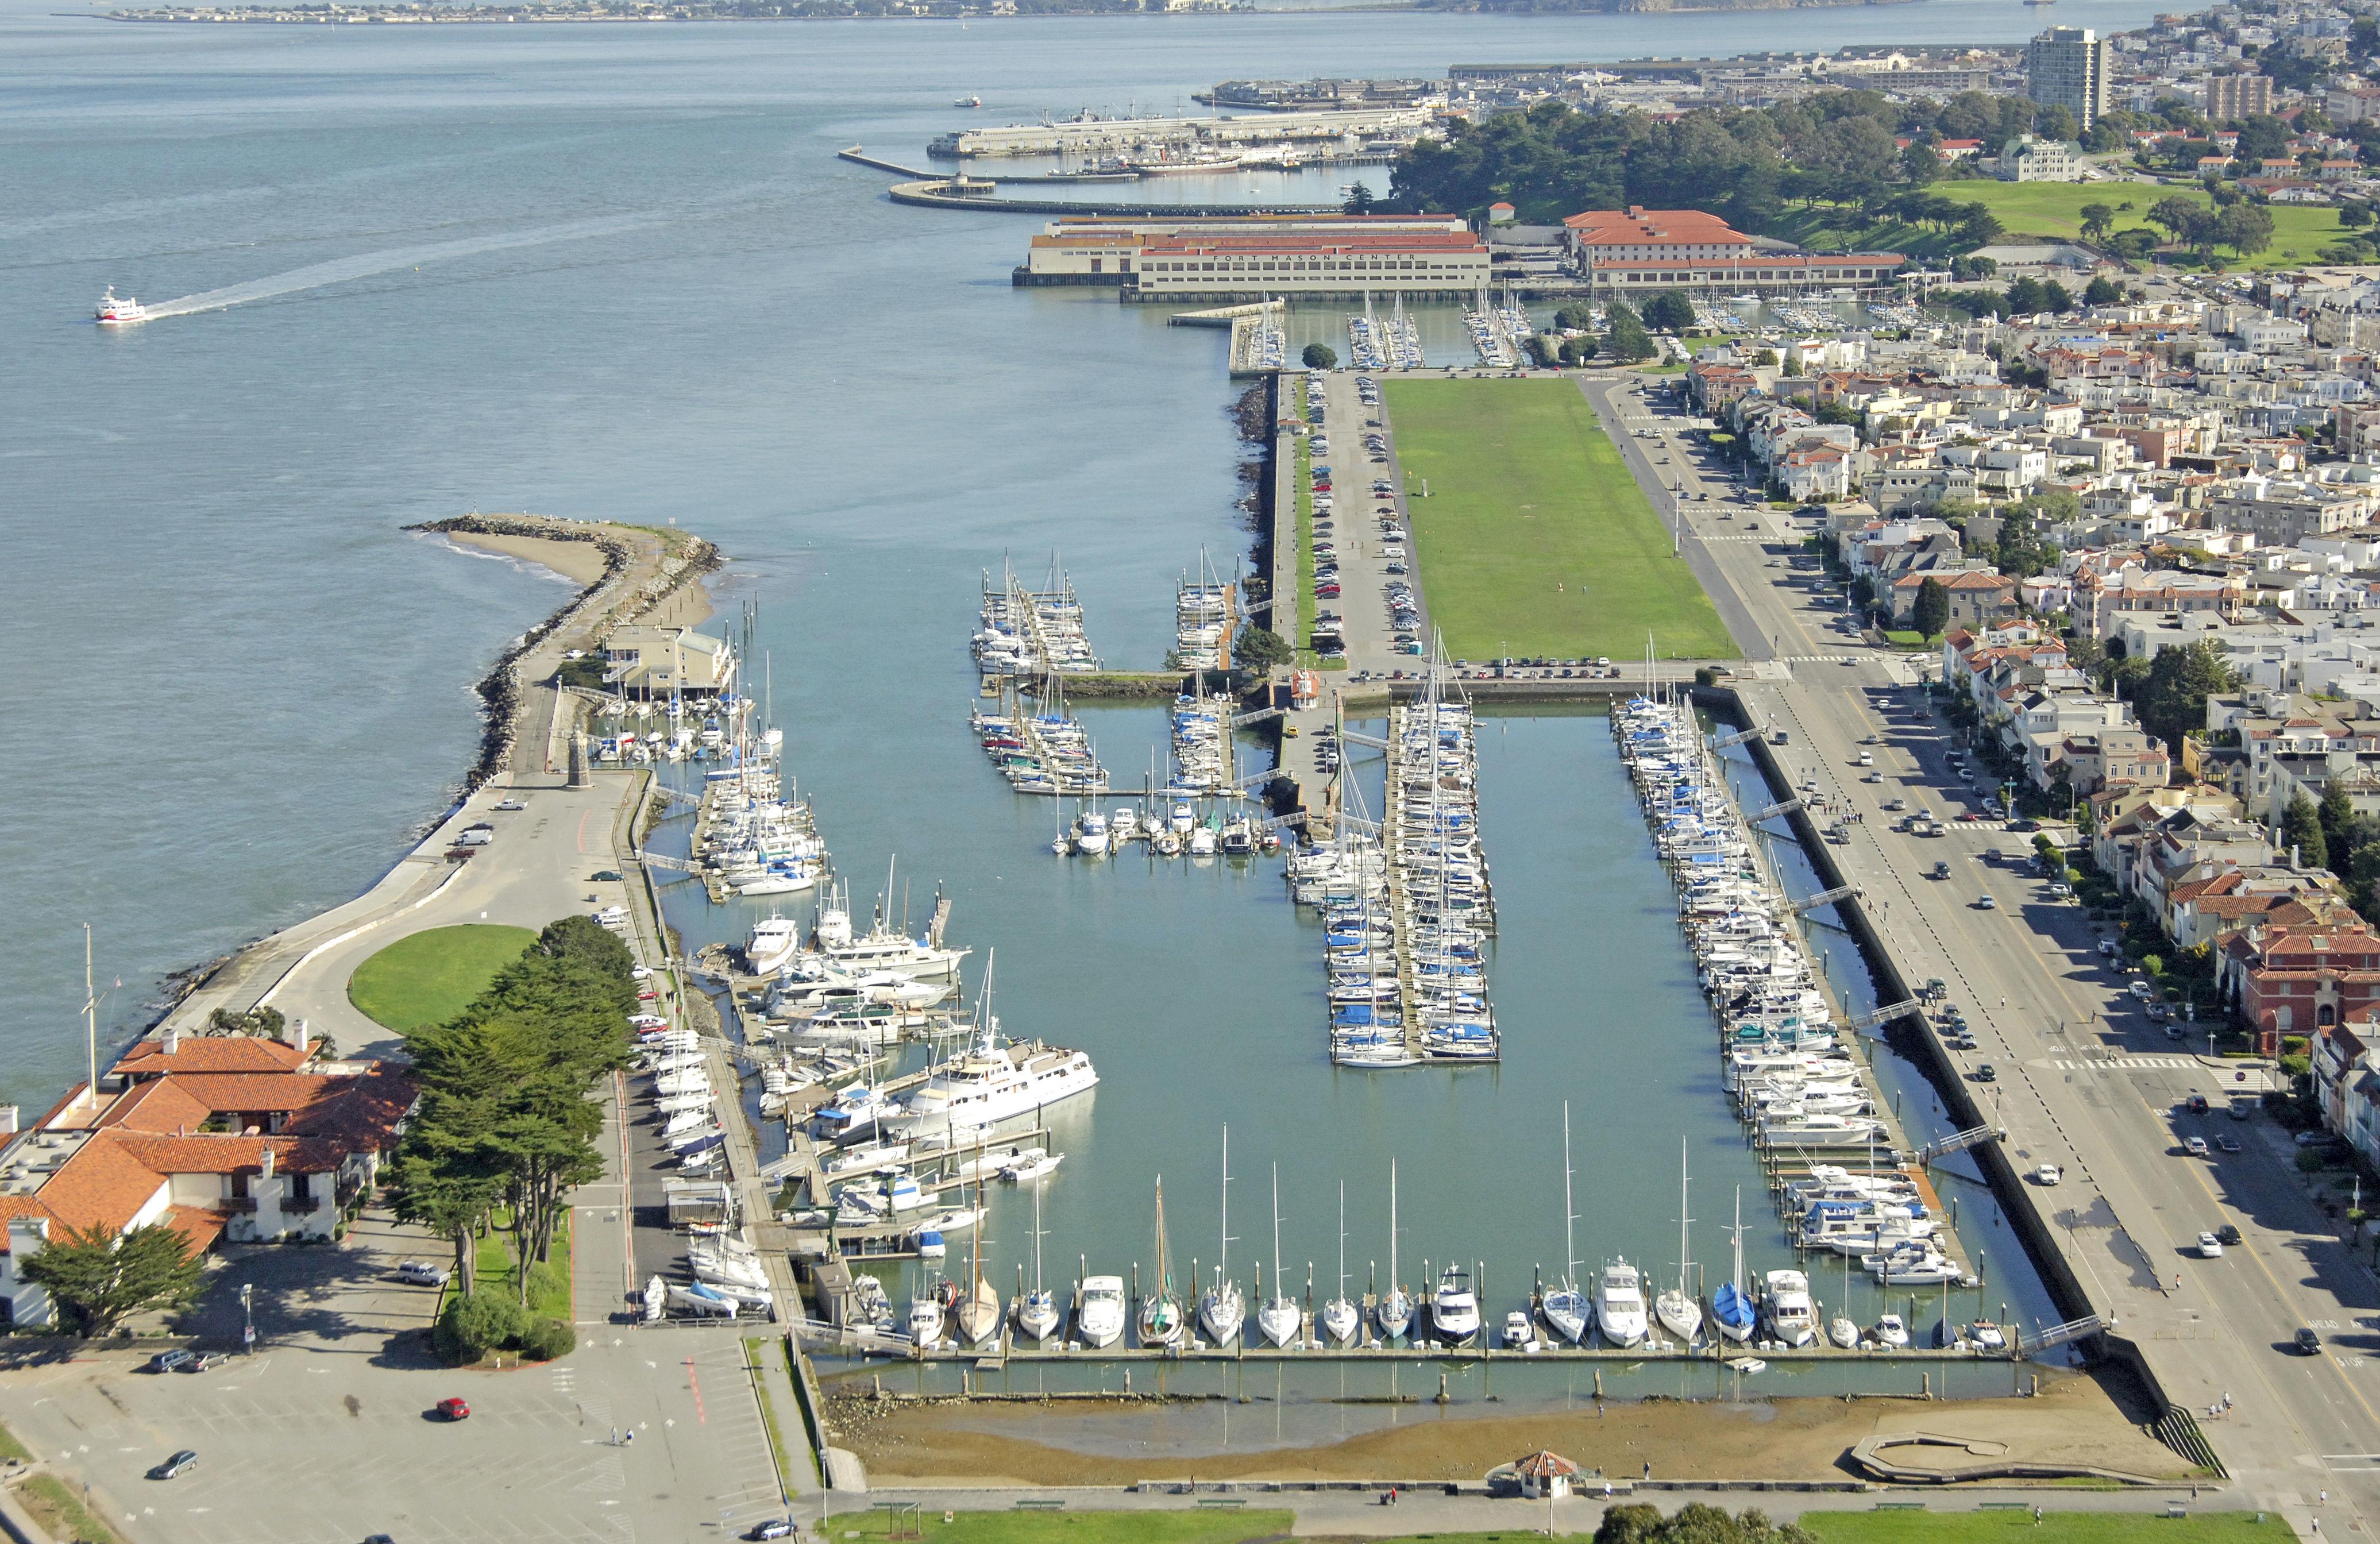 San Francisco Marina West Harbor in San Francisco, CA